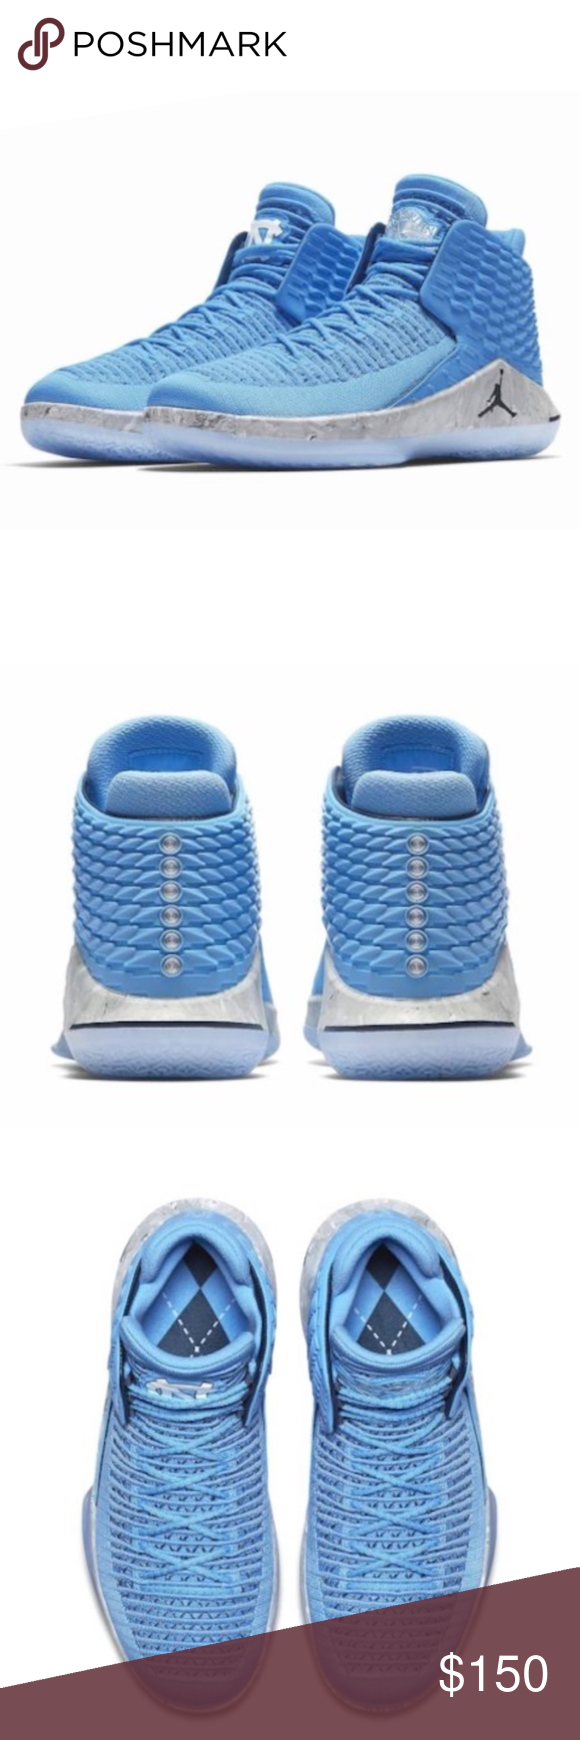 8401d655200035 Nike AIR JORDAN 32 Men s Basketball Shoe - UNC New in Box As a tribute to